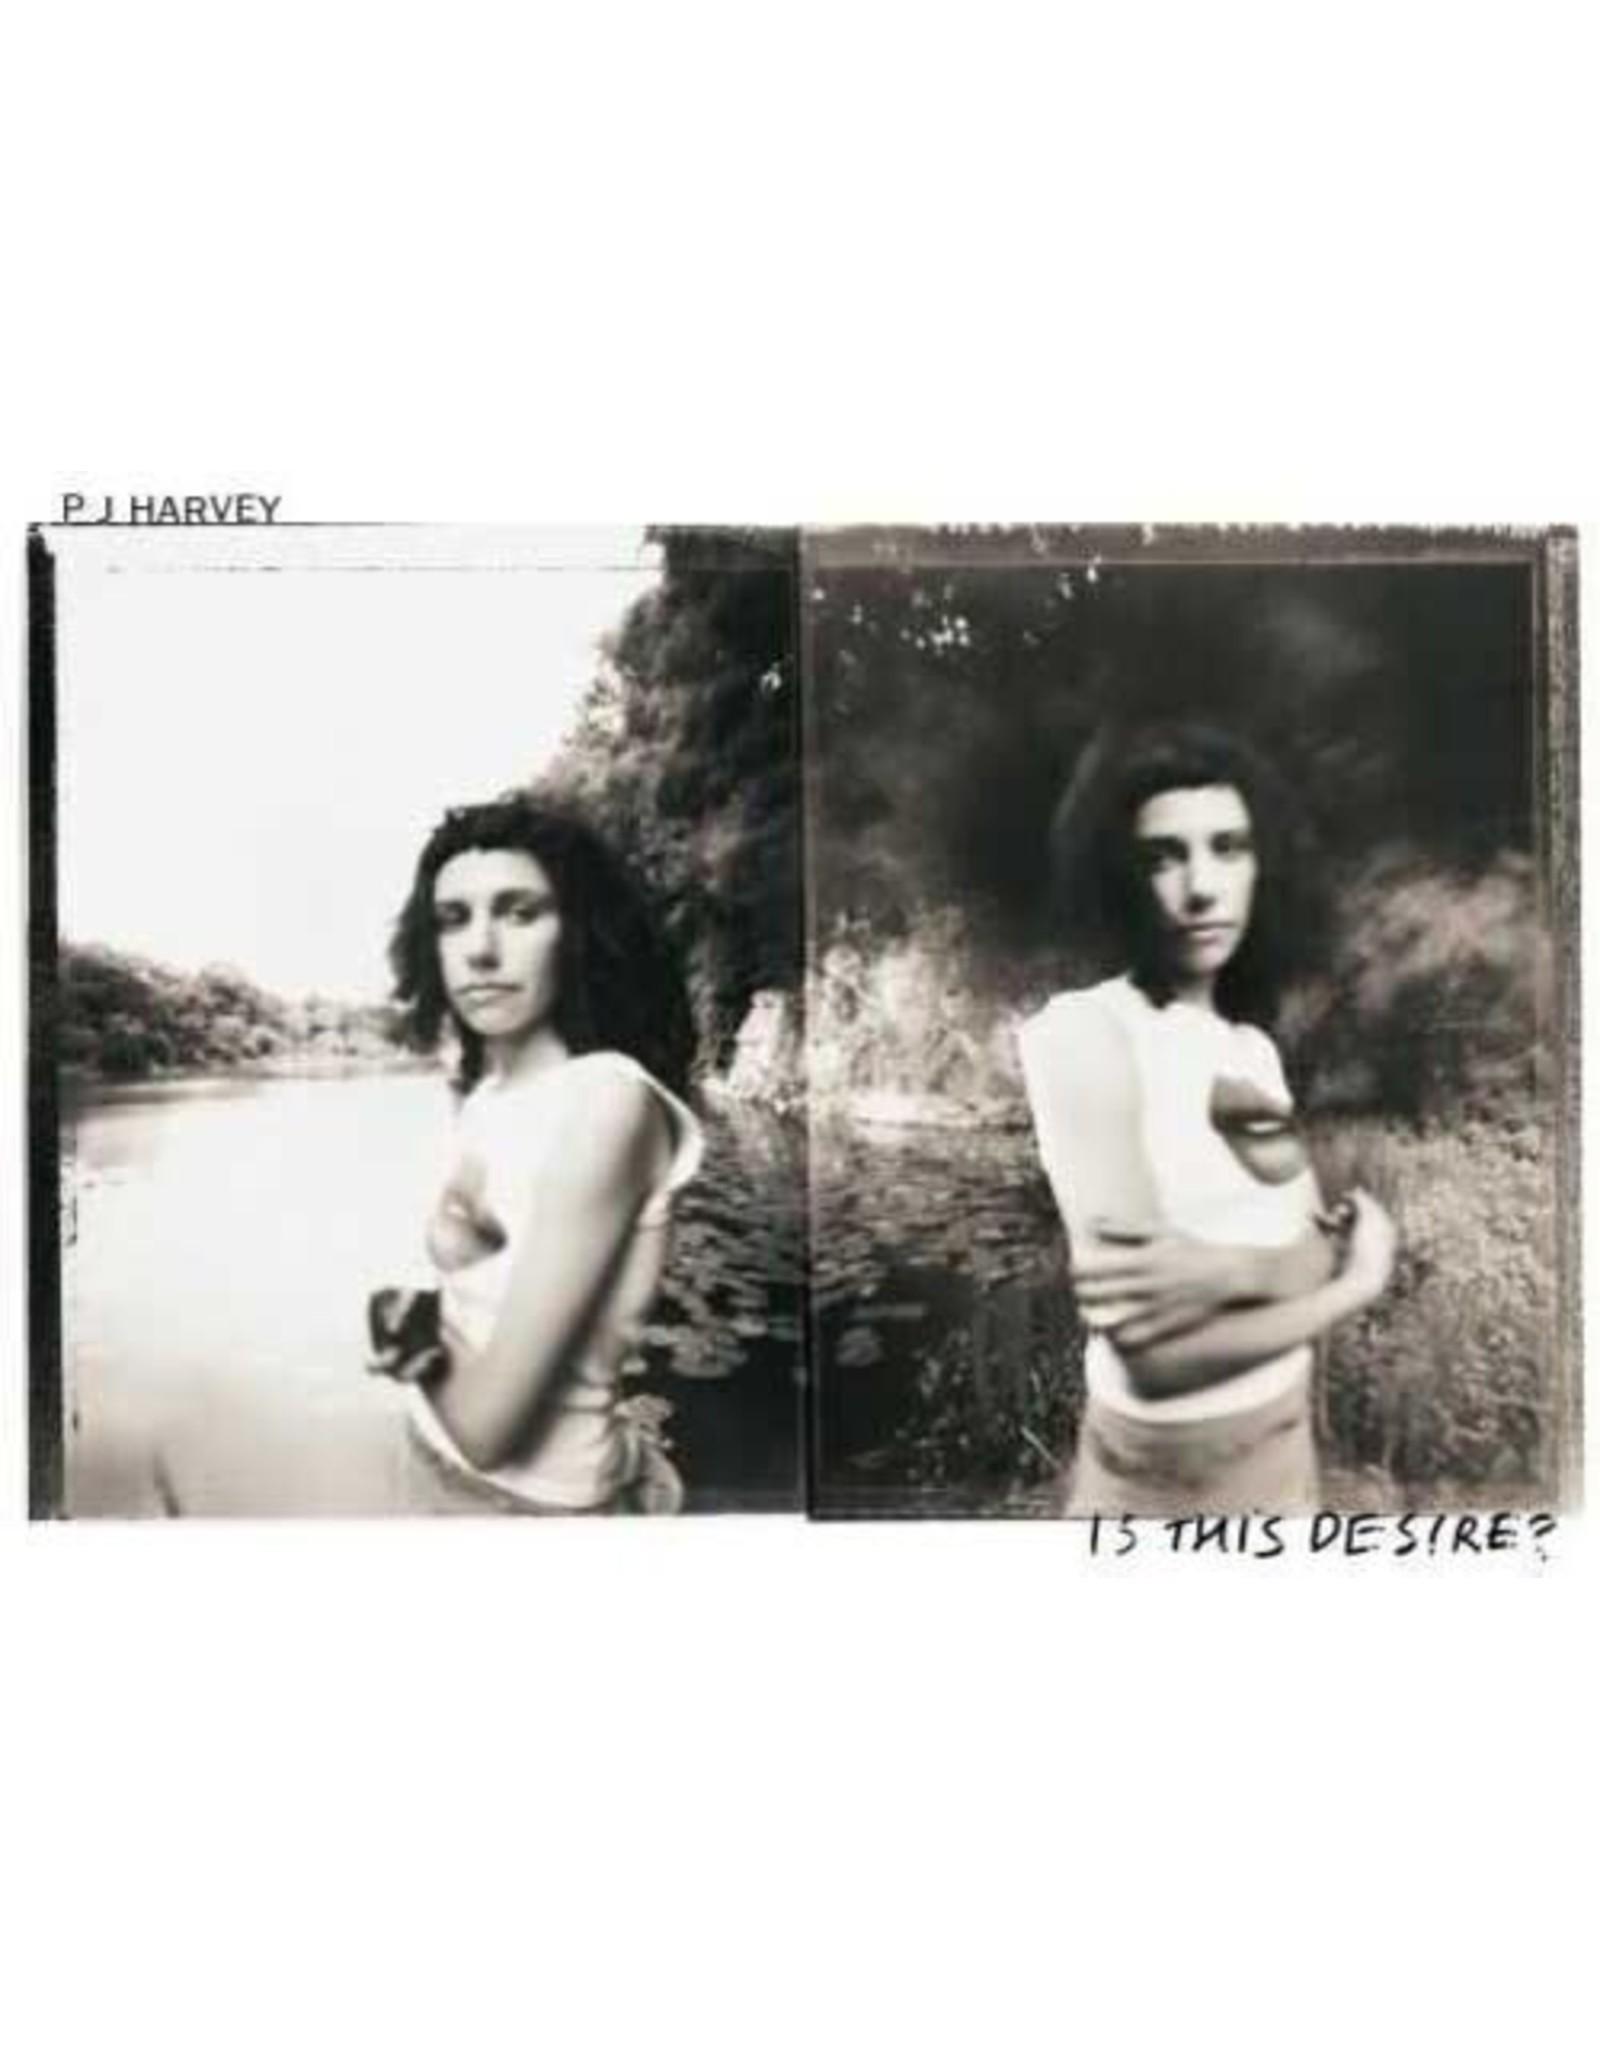 New Vinyl PJ Harvey - Is This Desire? LP